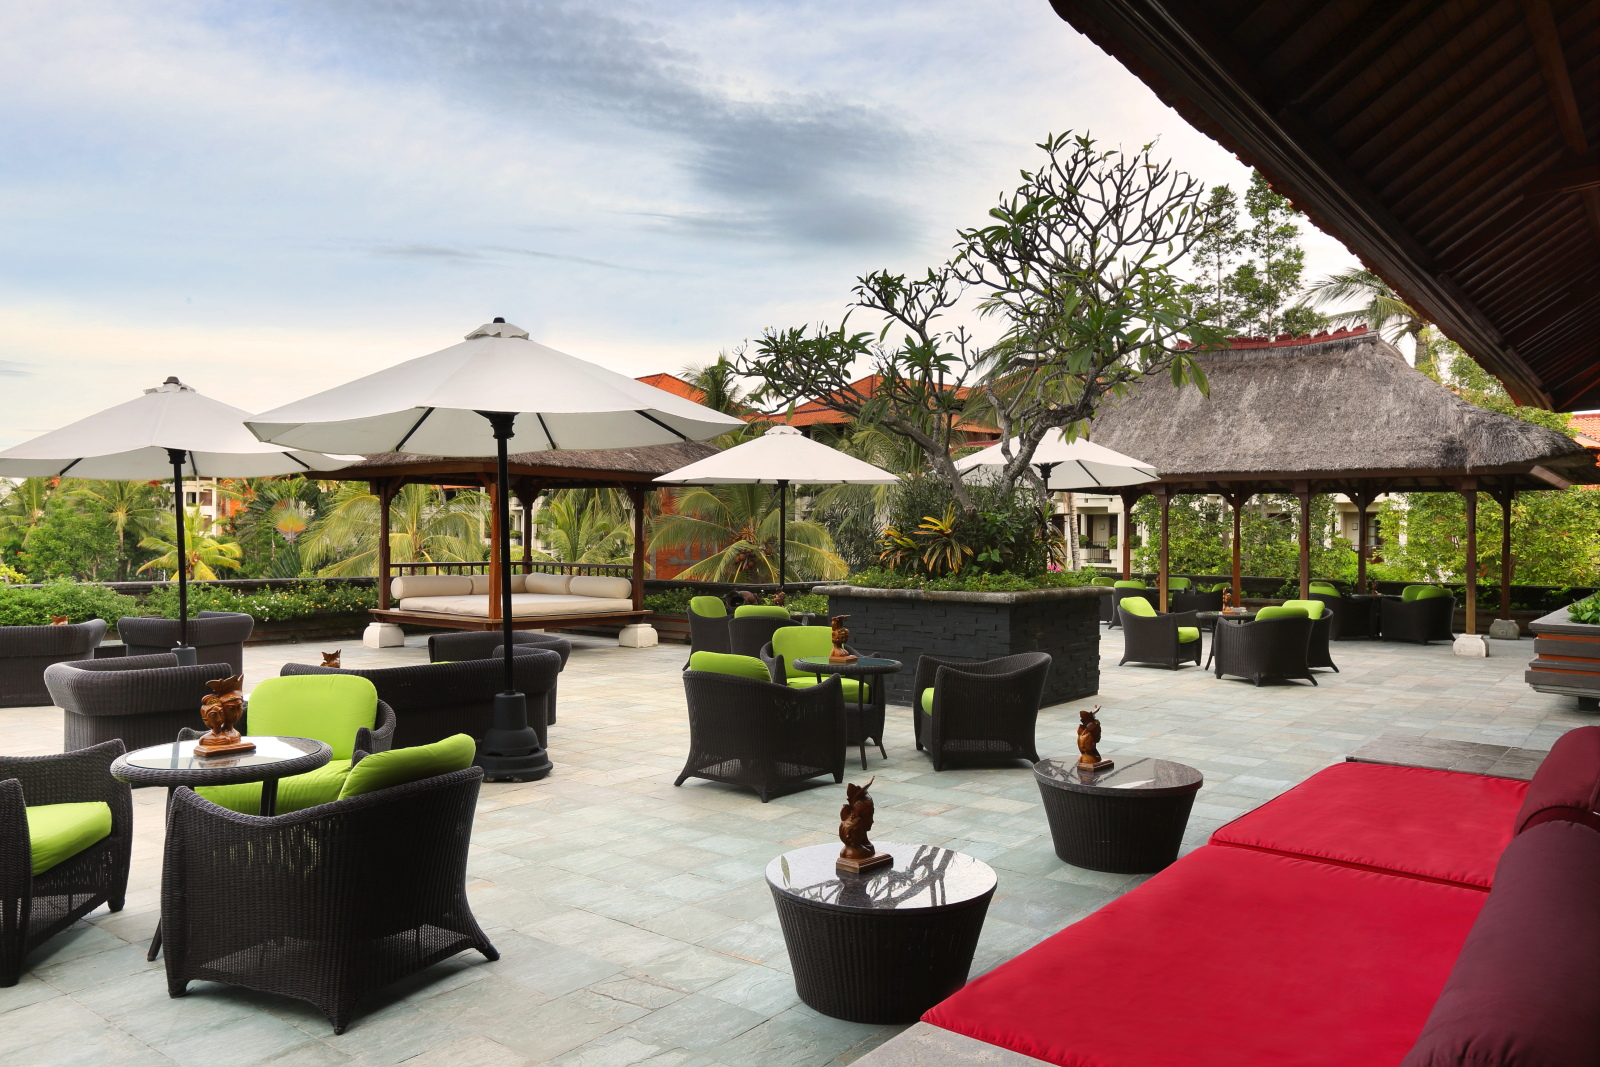 ayodya resort bali asienreisen von asian dreams gmbh. Black Bedroom Furniture Sets. Home Design Ideas